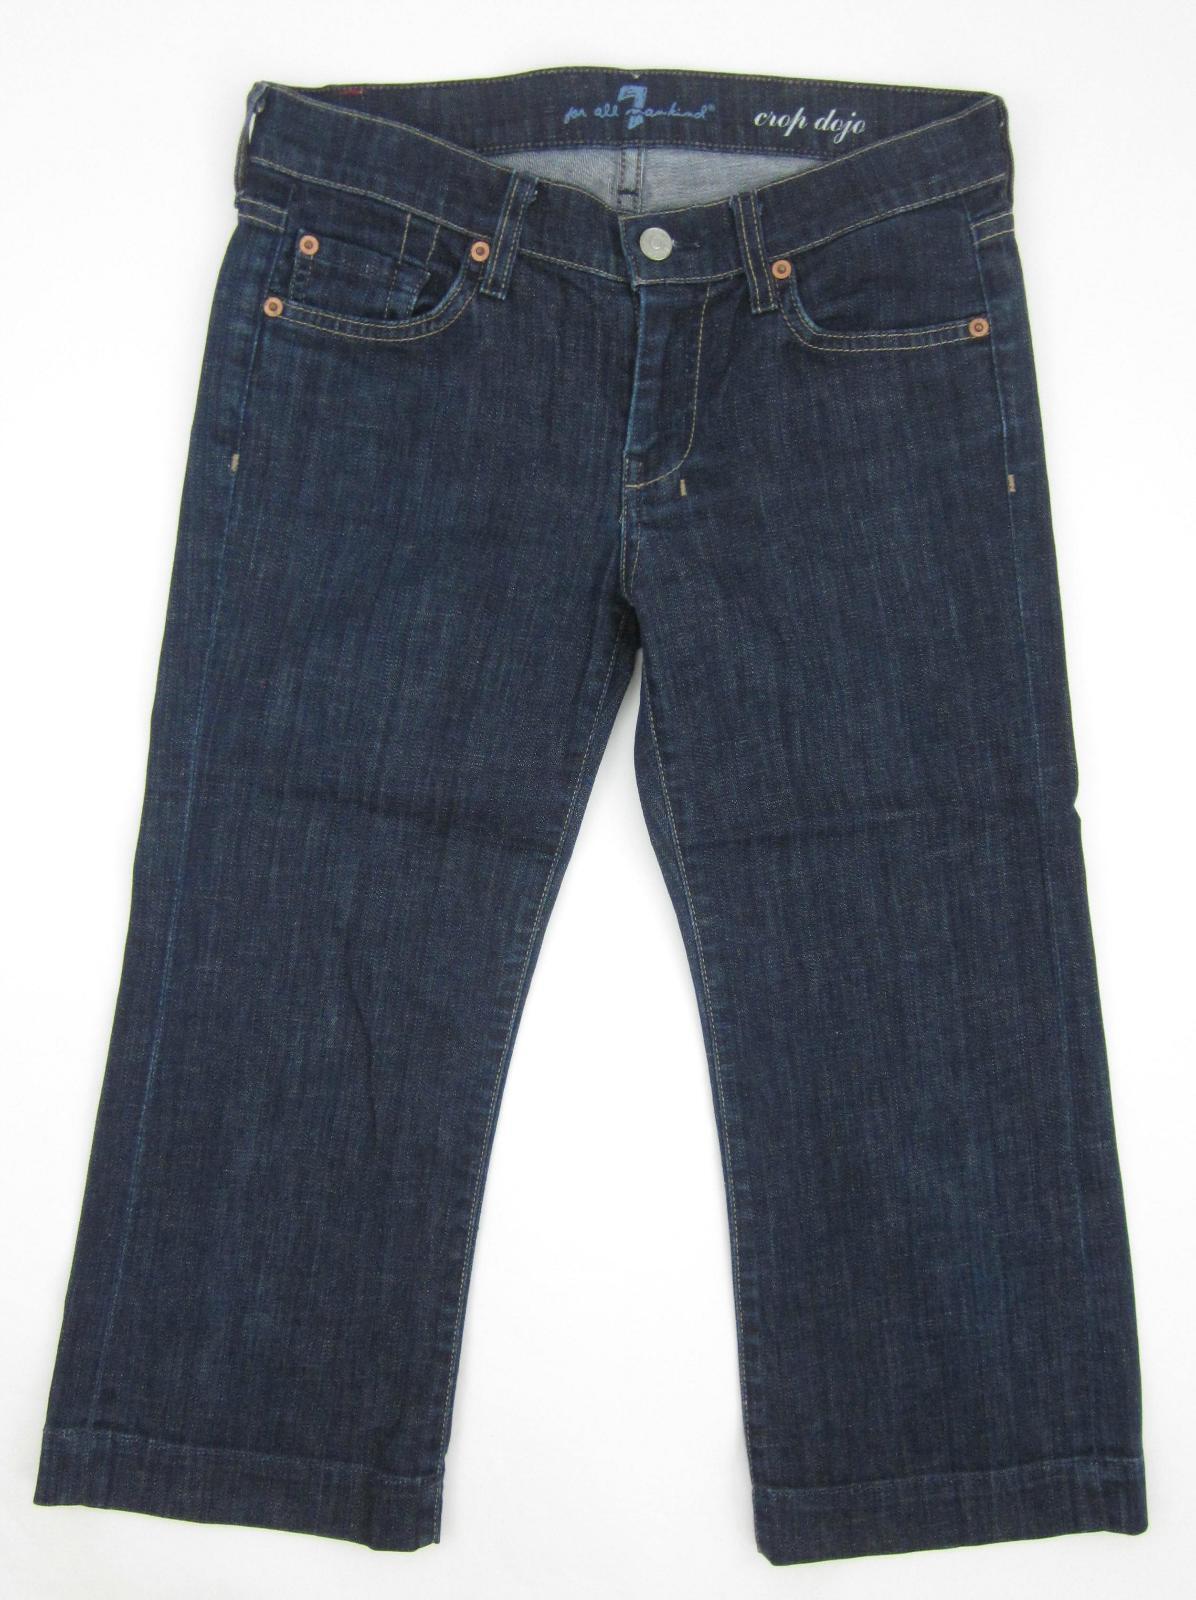 Seven 7 For All Mankind Crop Dojo Capri Jeans Size 27 Dark Wash Excellent